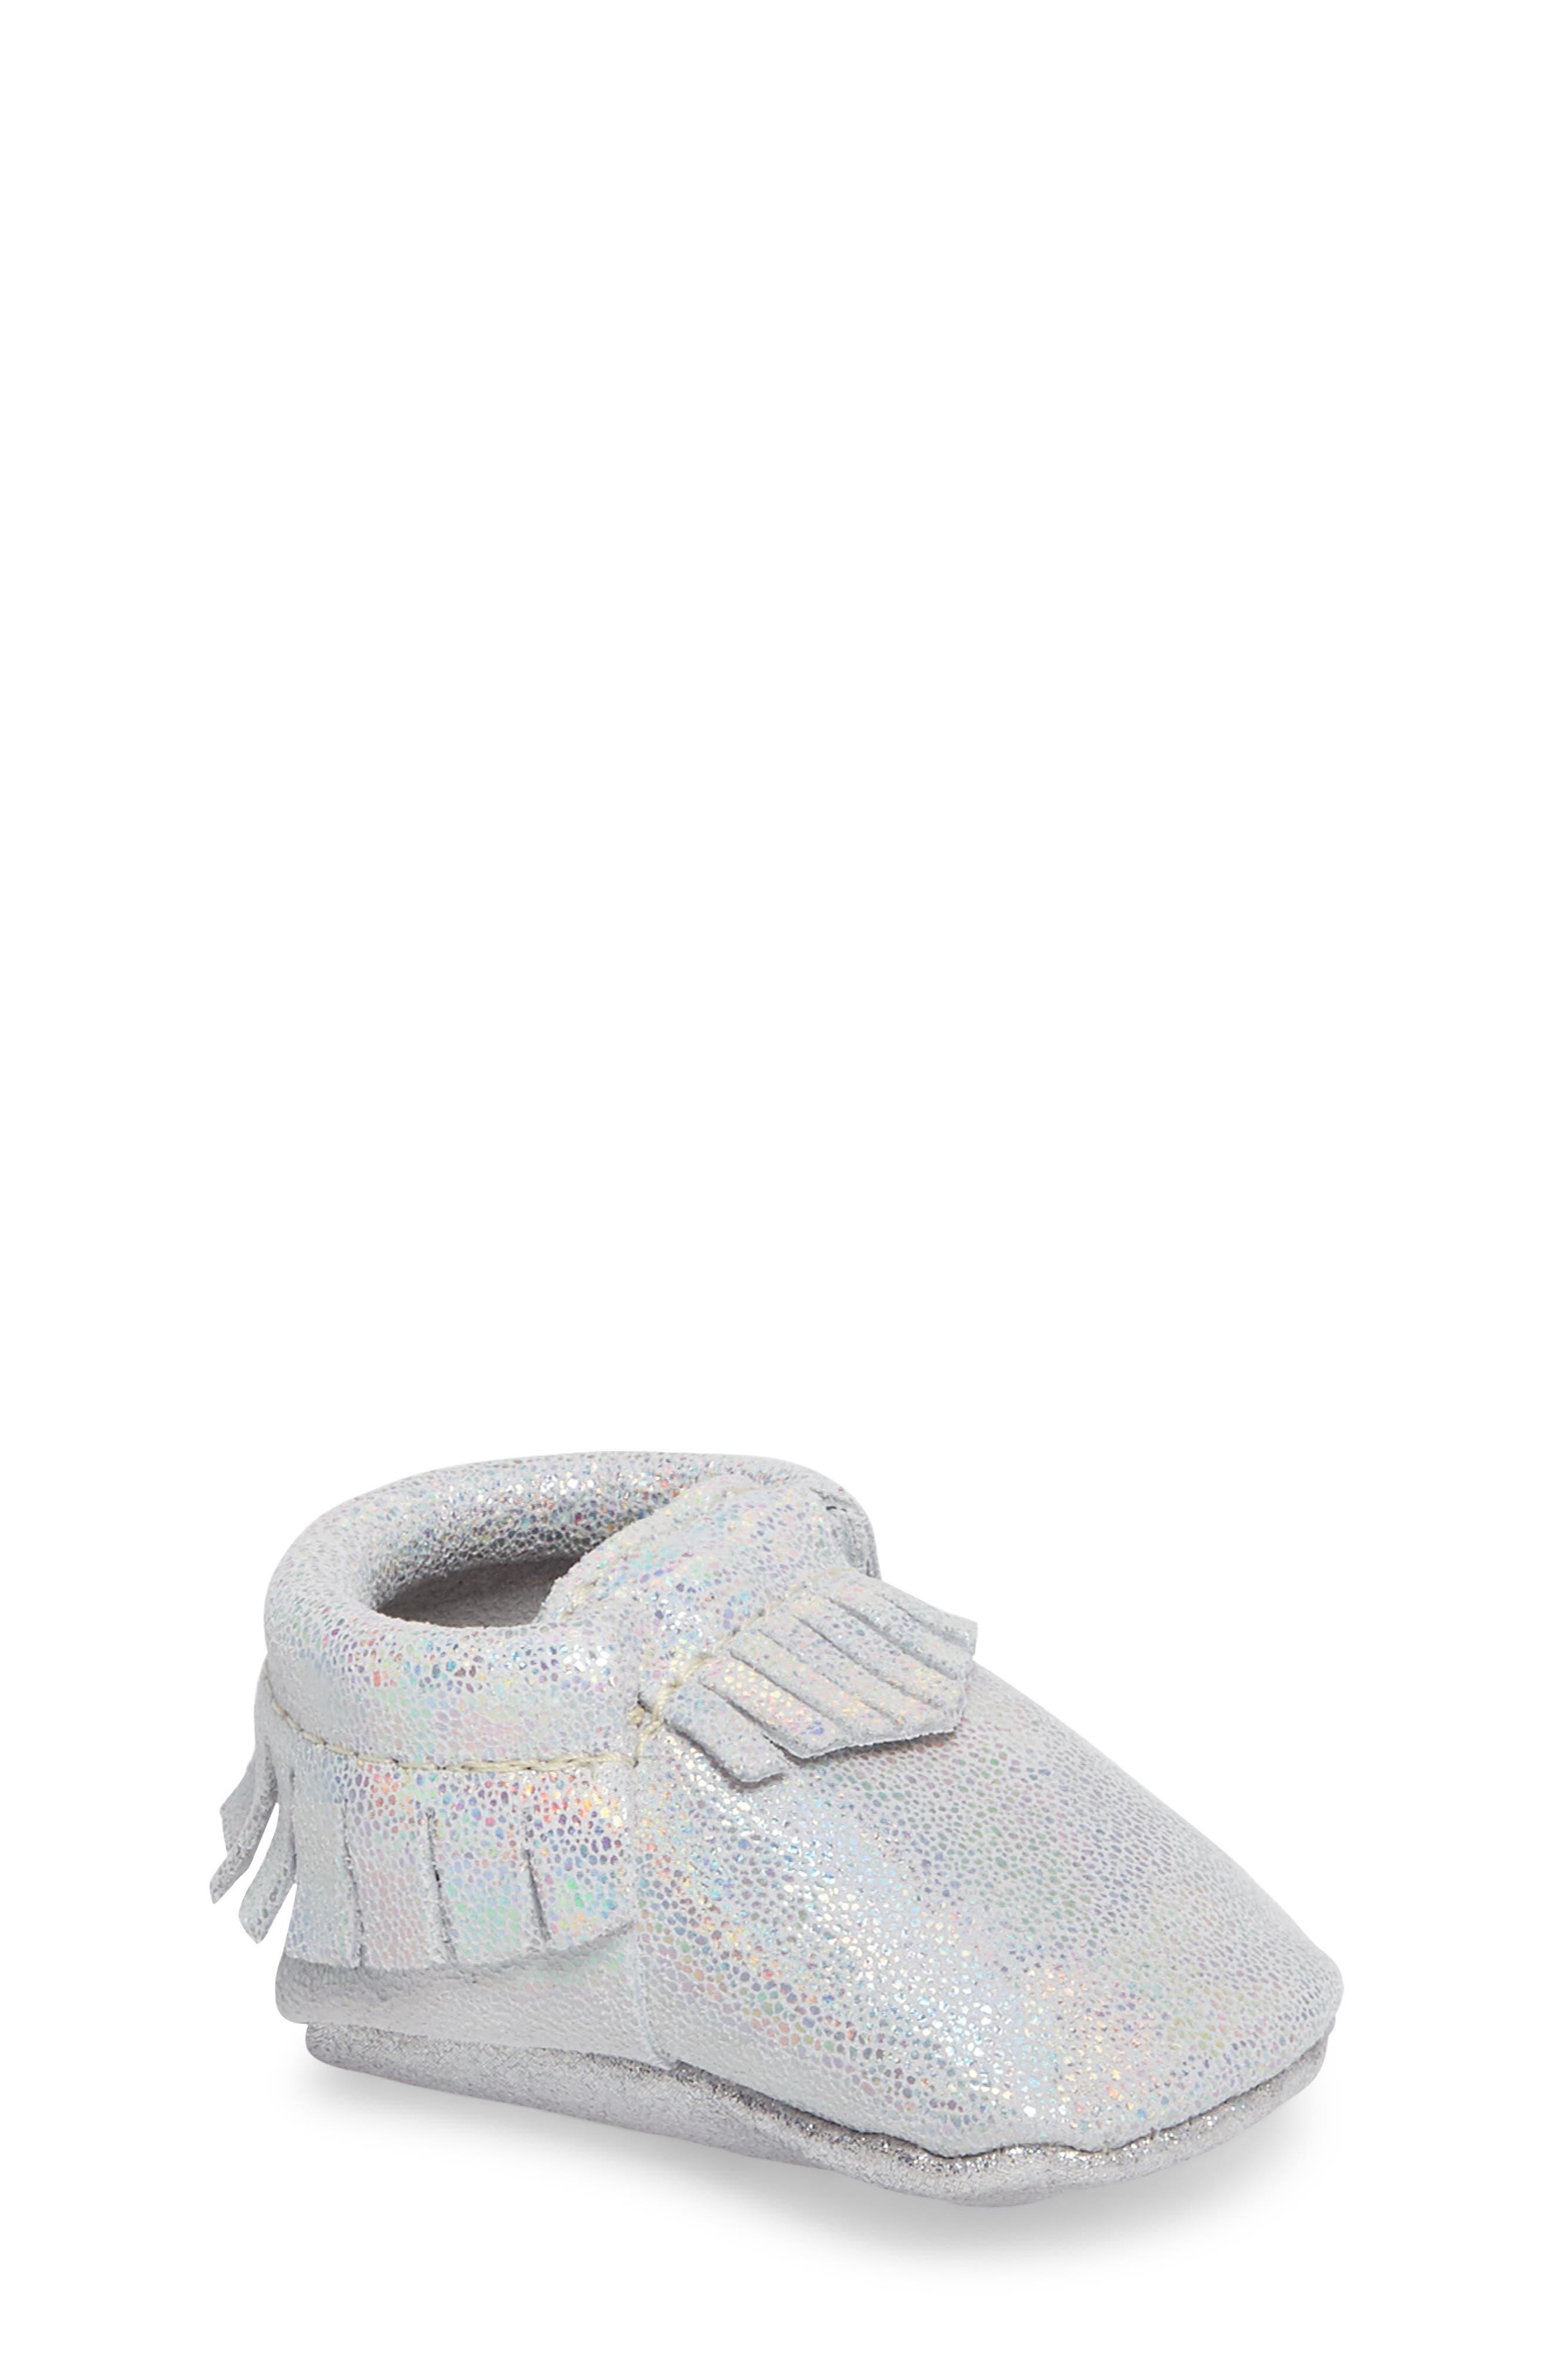 Freshly Picked Hologram Moccasin Crib Shoe (Baby, Walker)